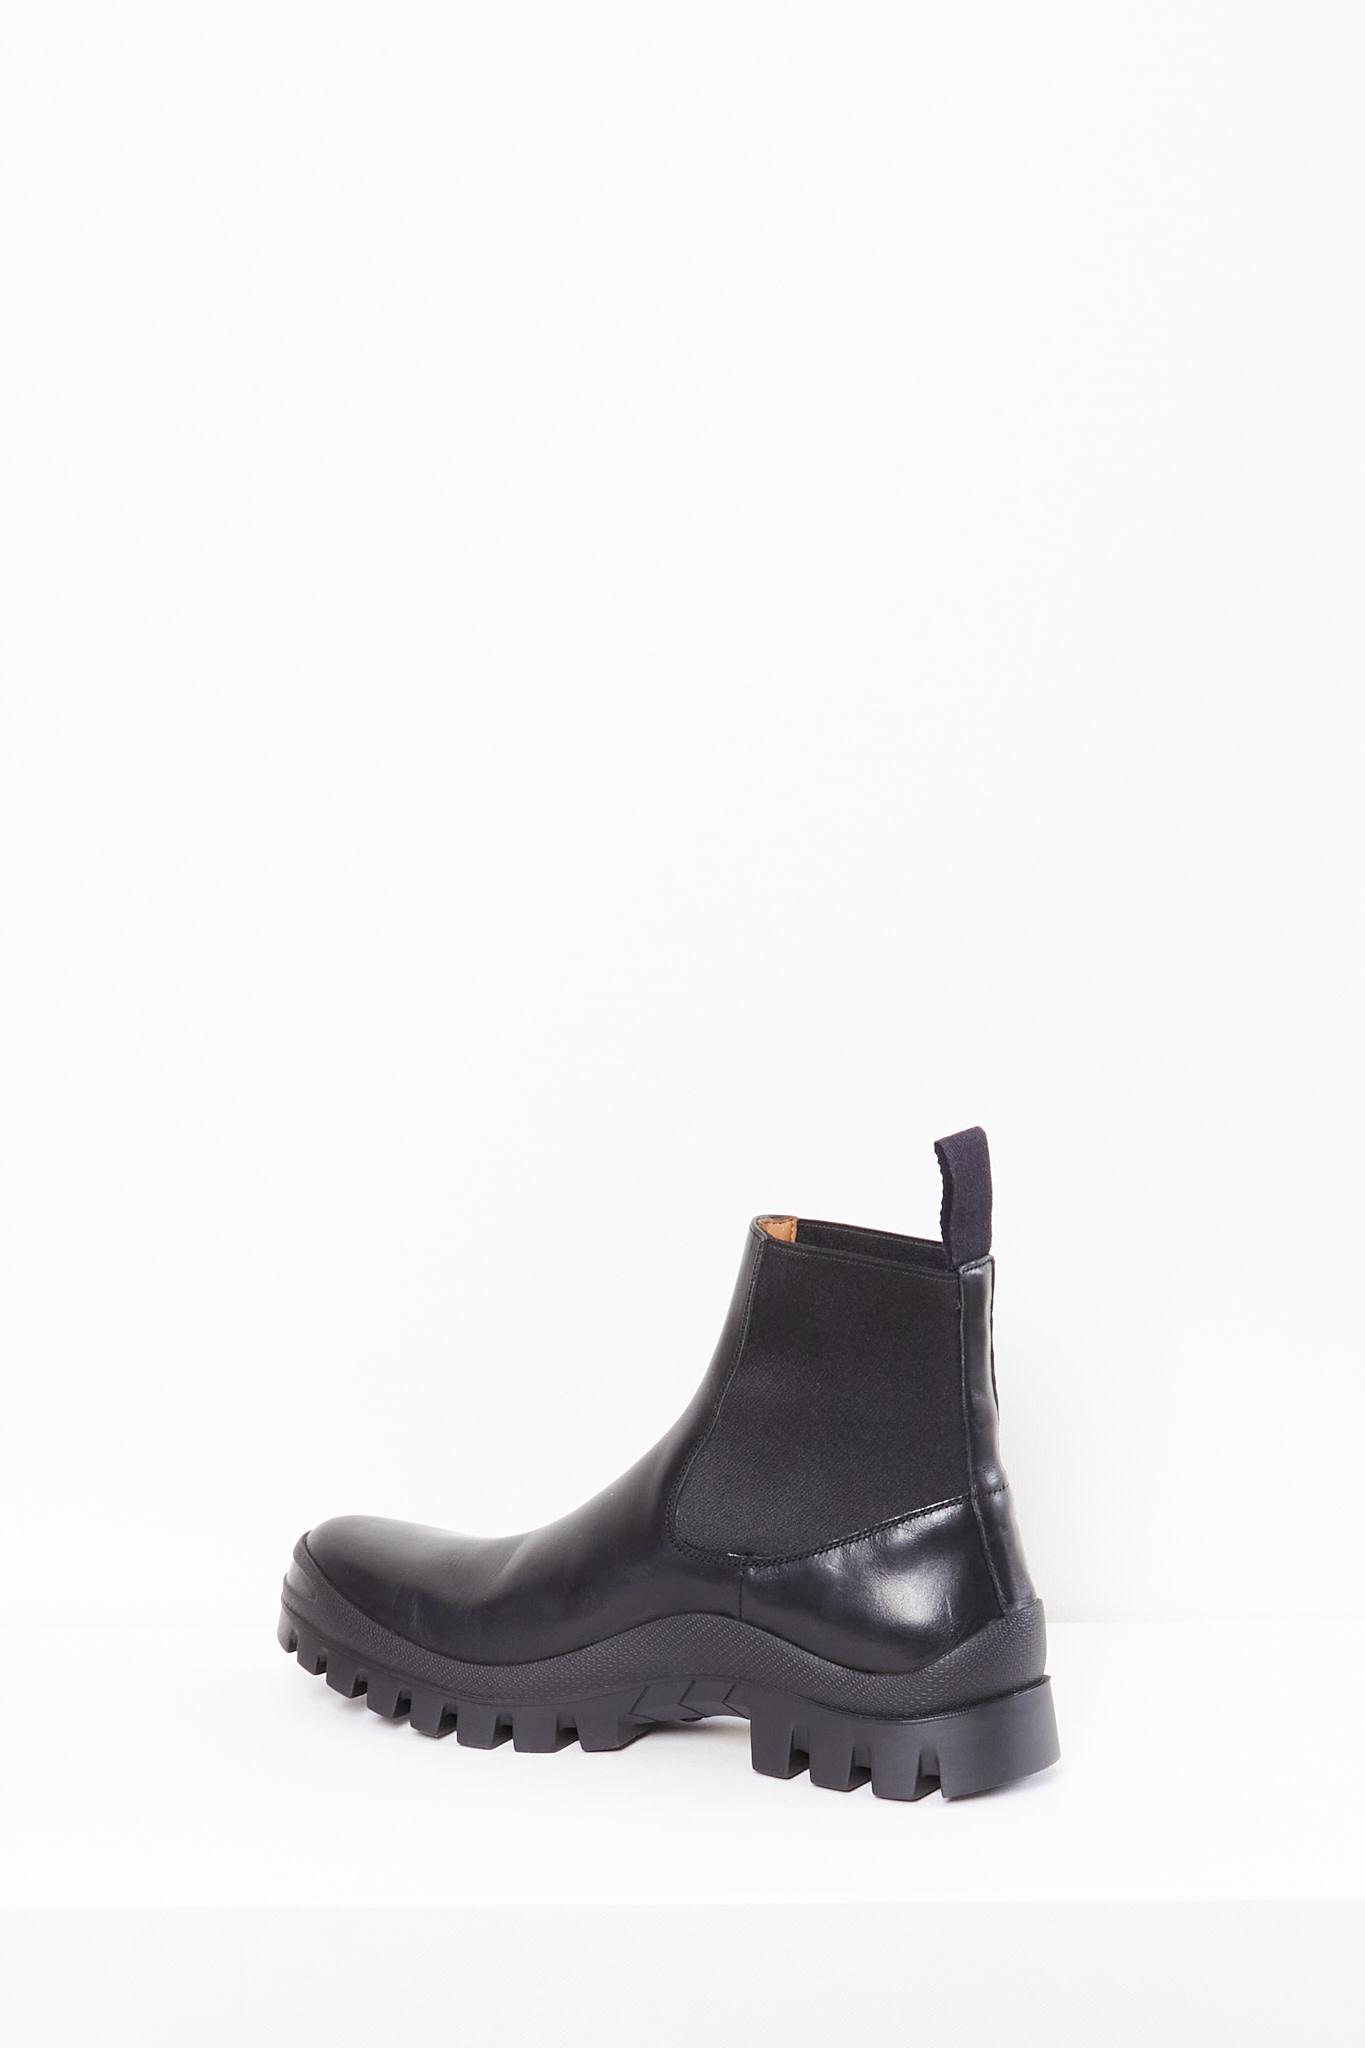 atp - Catania short boots